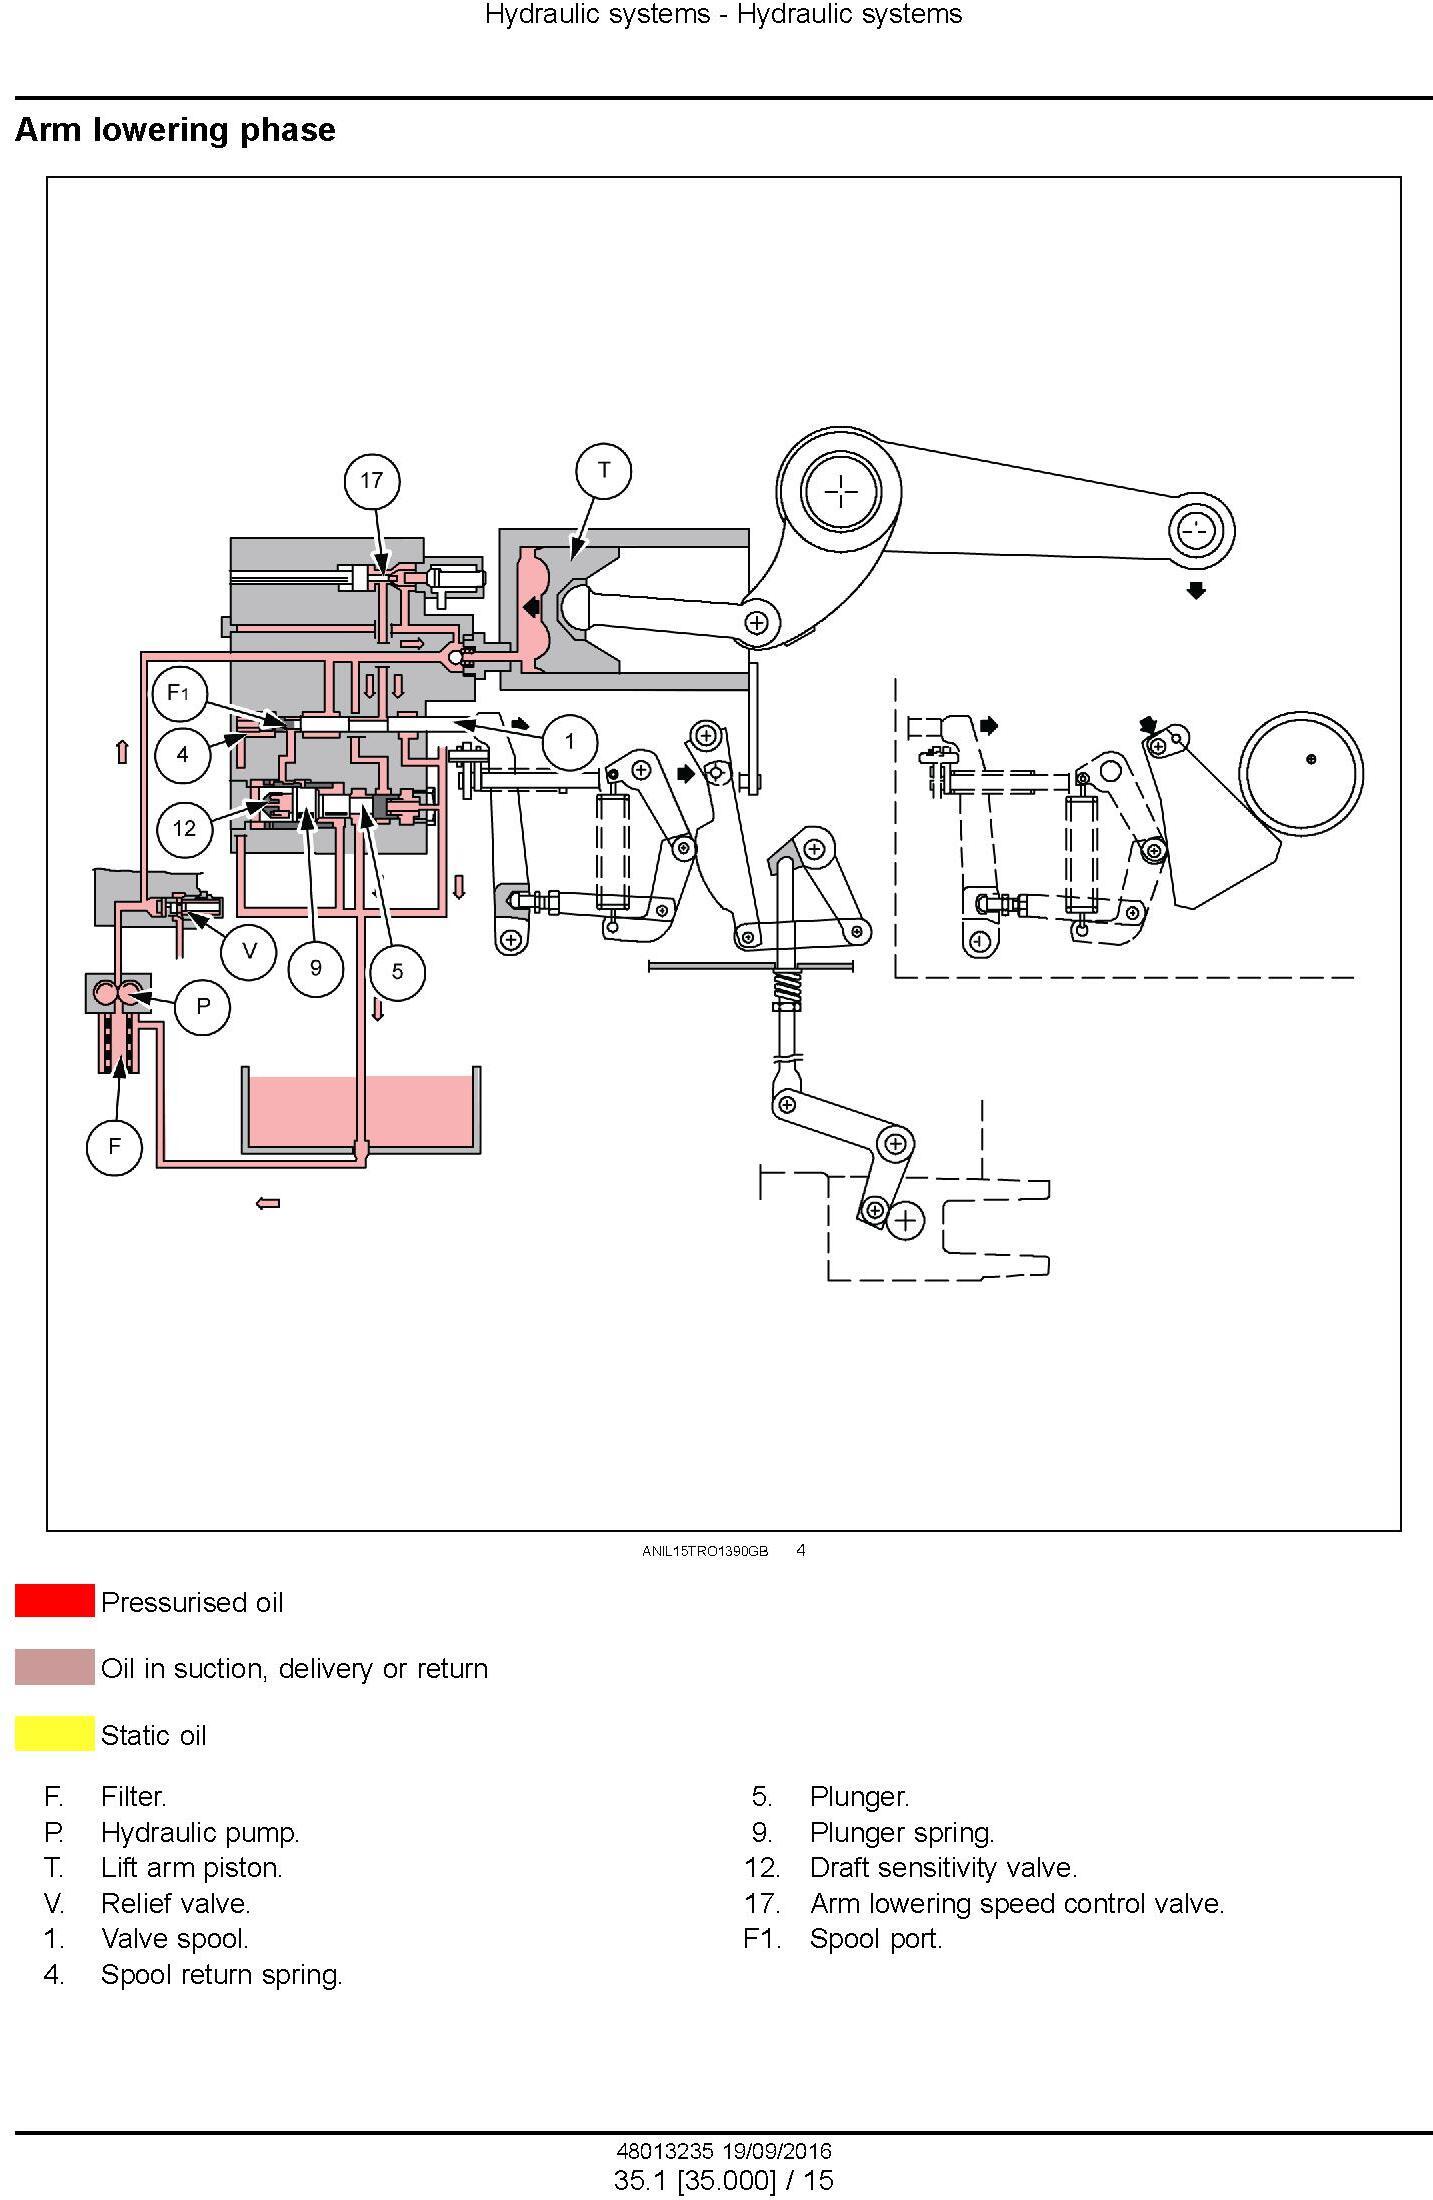 New Holland TD5.85, TD5.95, TD5.105, TD5.115 Tractor Service Manual - 2